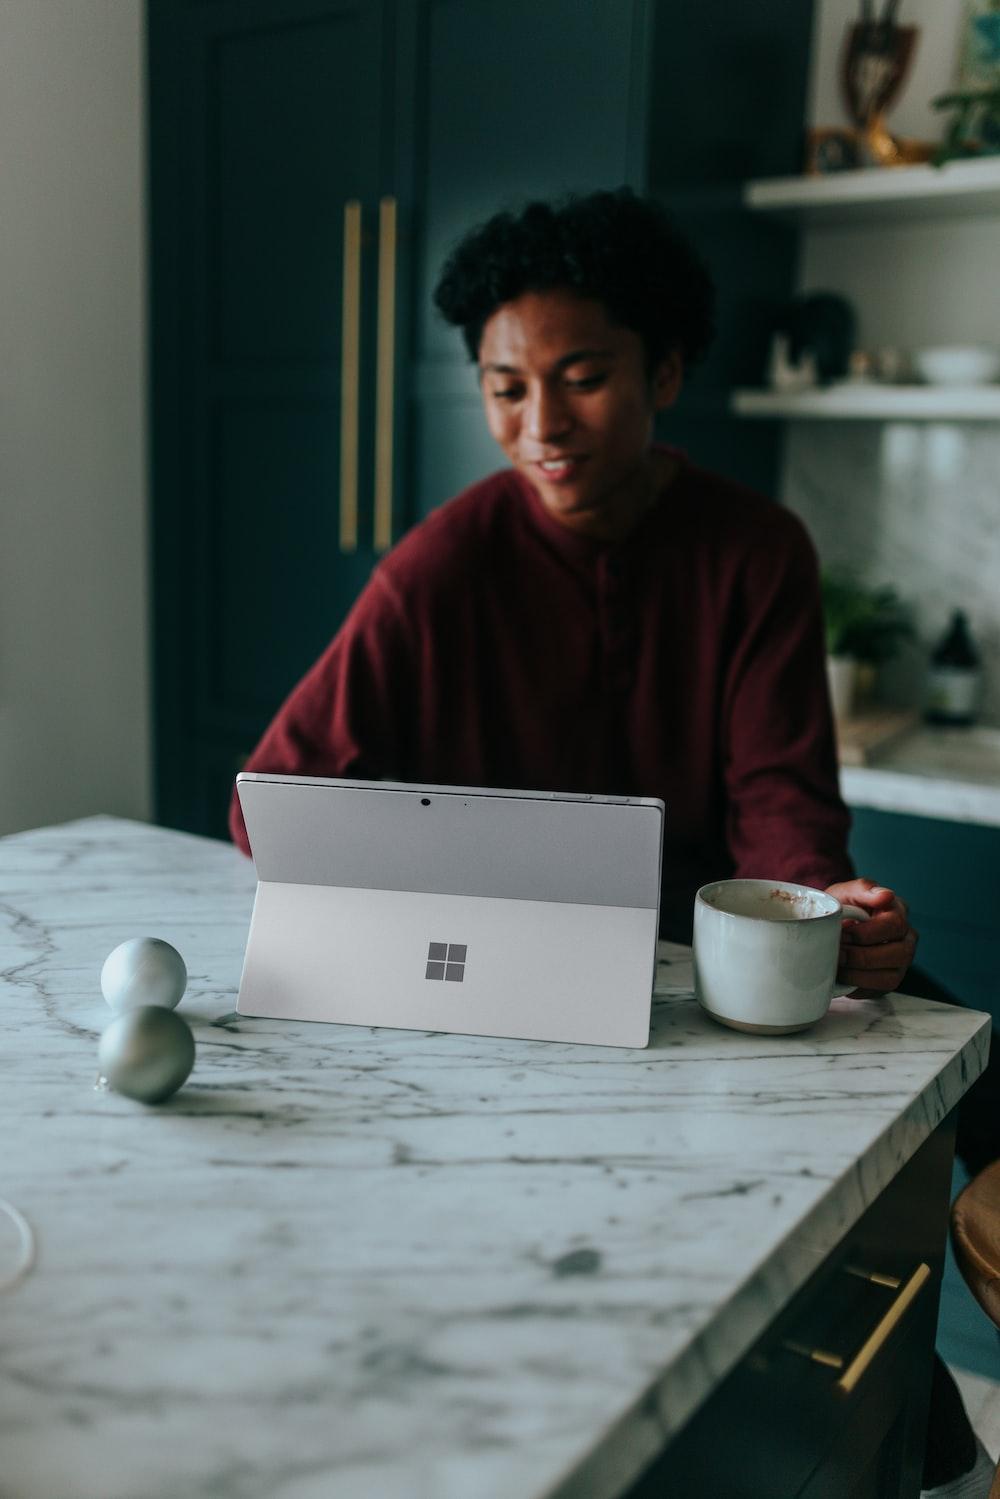 Man sitting at kitchen table watching something on his Surface laptop drinking coffee